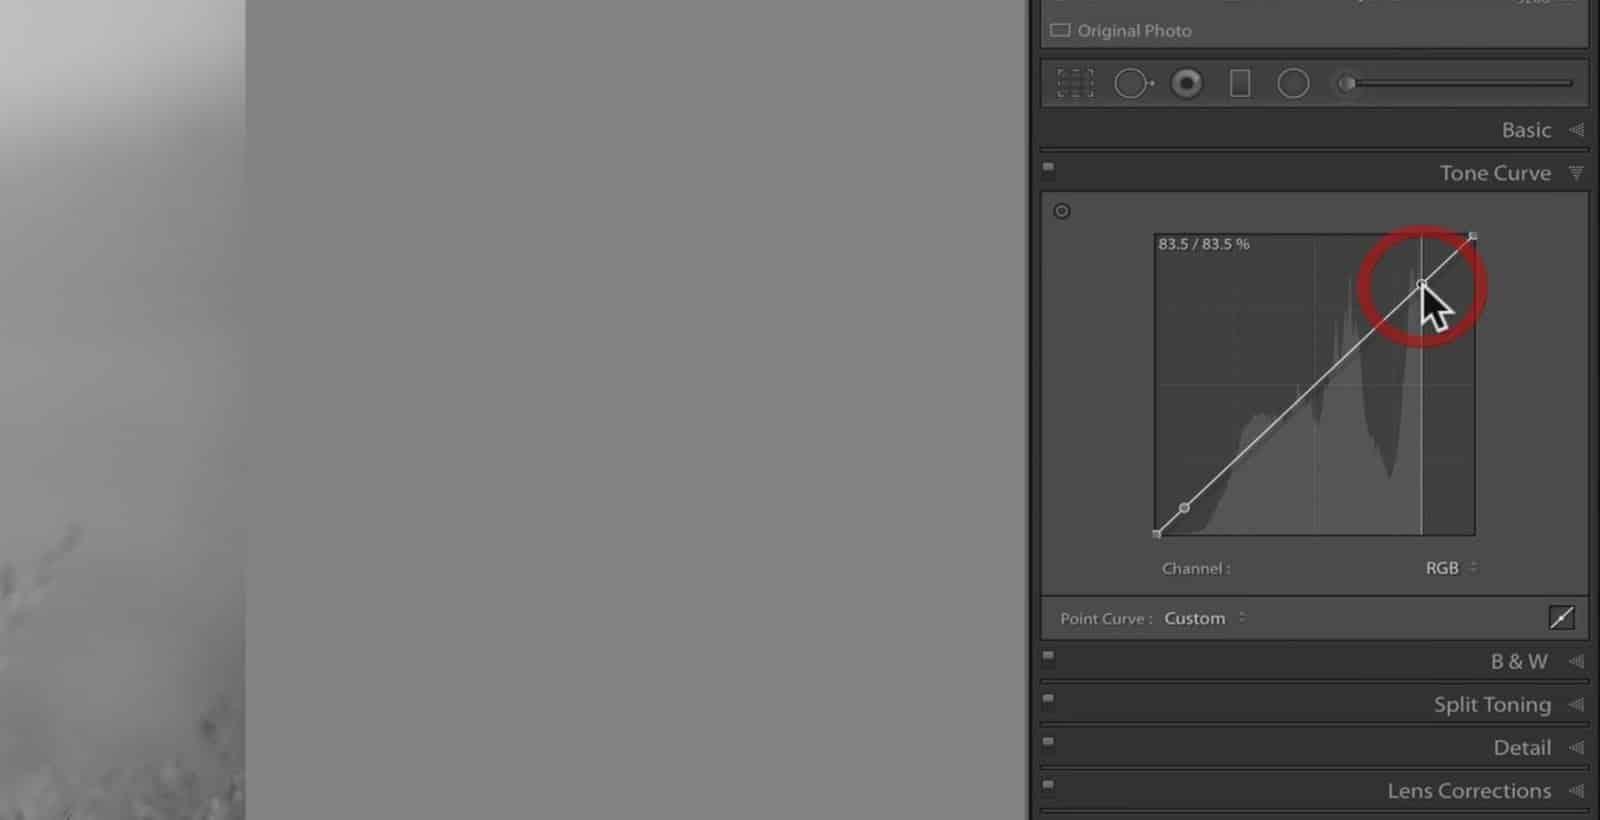 Changing Tones Through Curve - CreativeRAW